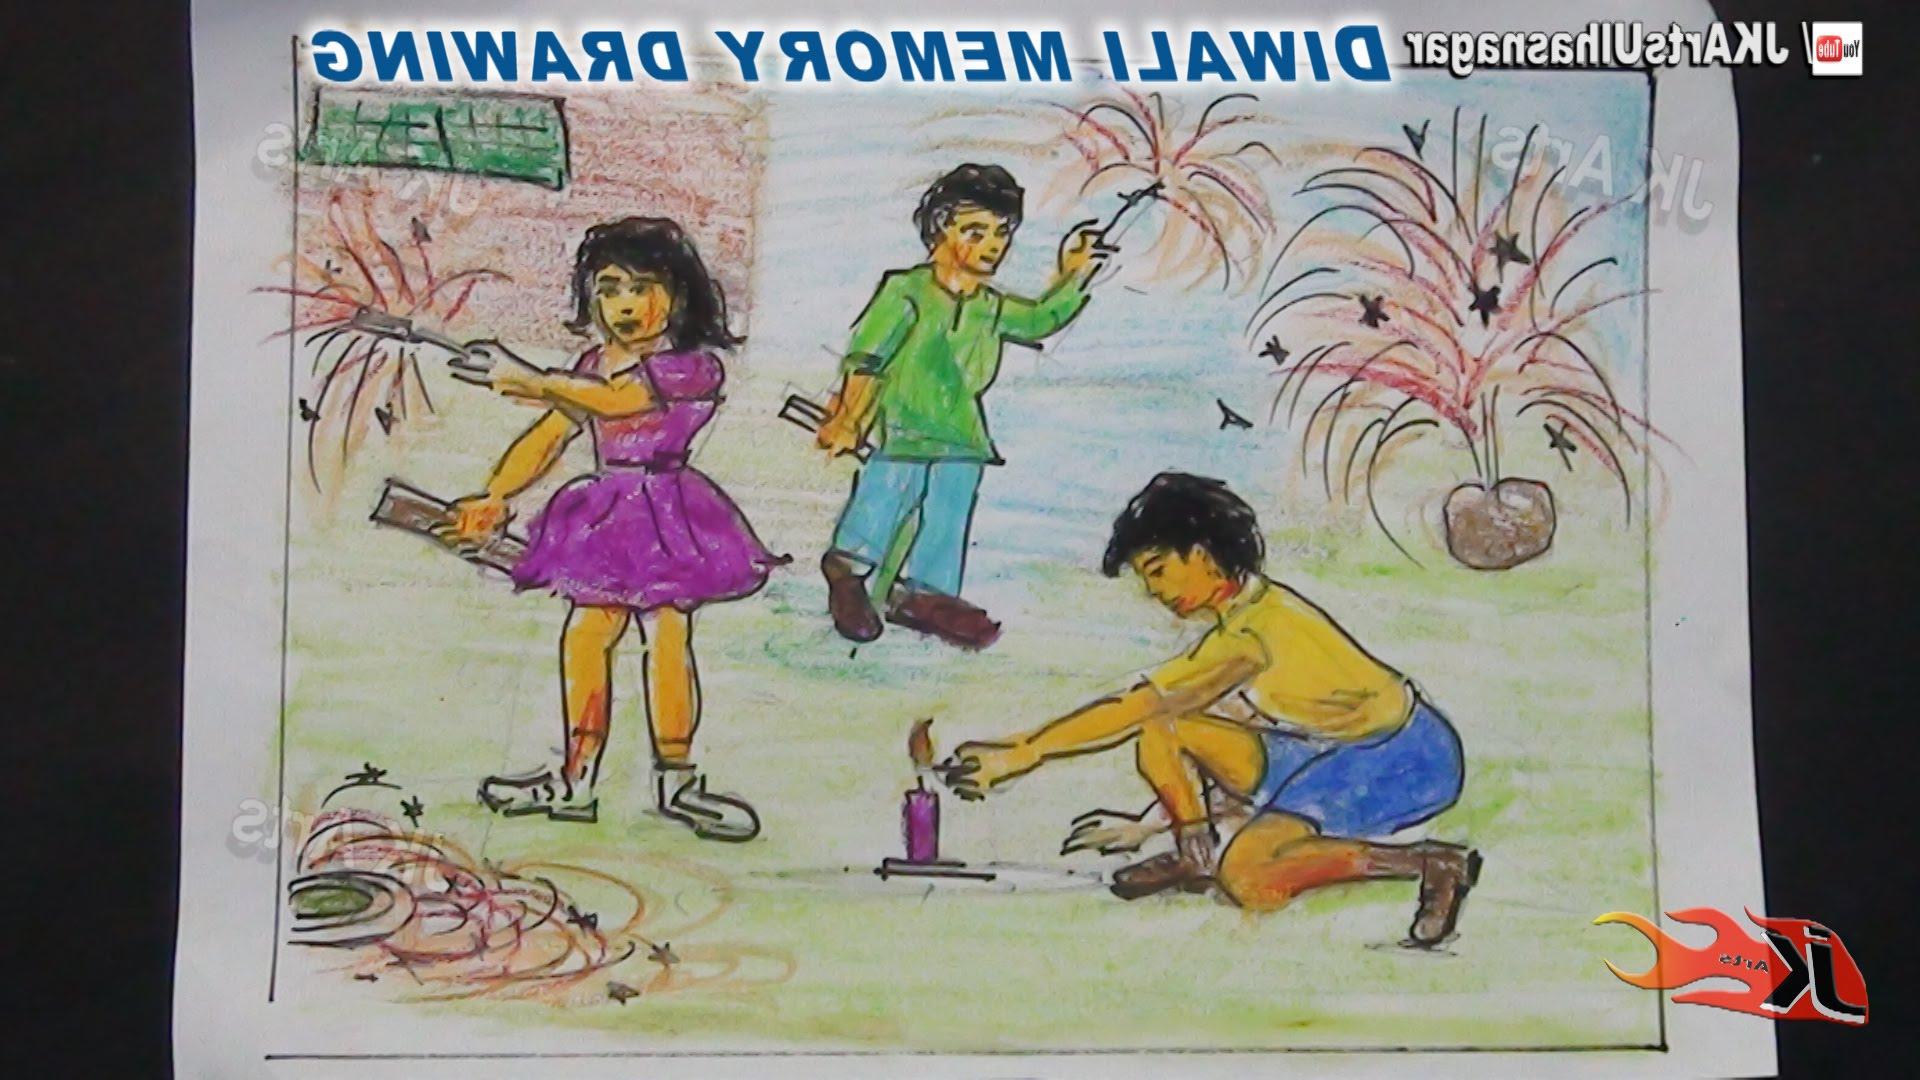 1920x1080 Diwali Festival Paintings For Children Happy Diwali Memory Drawing